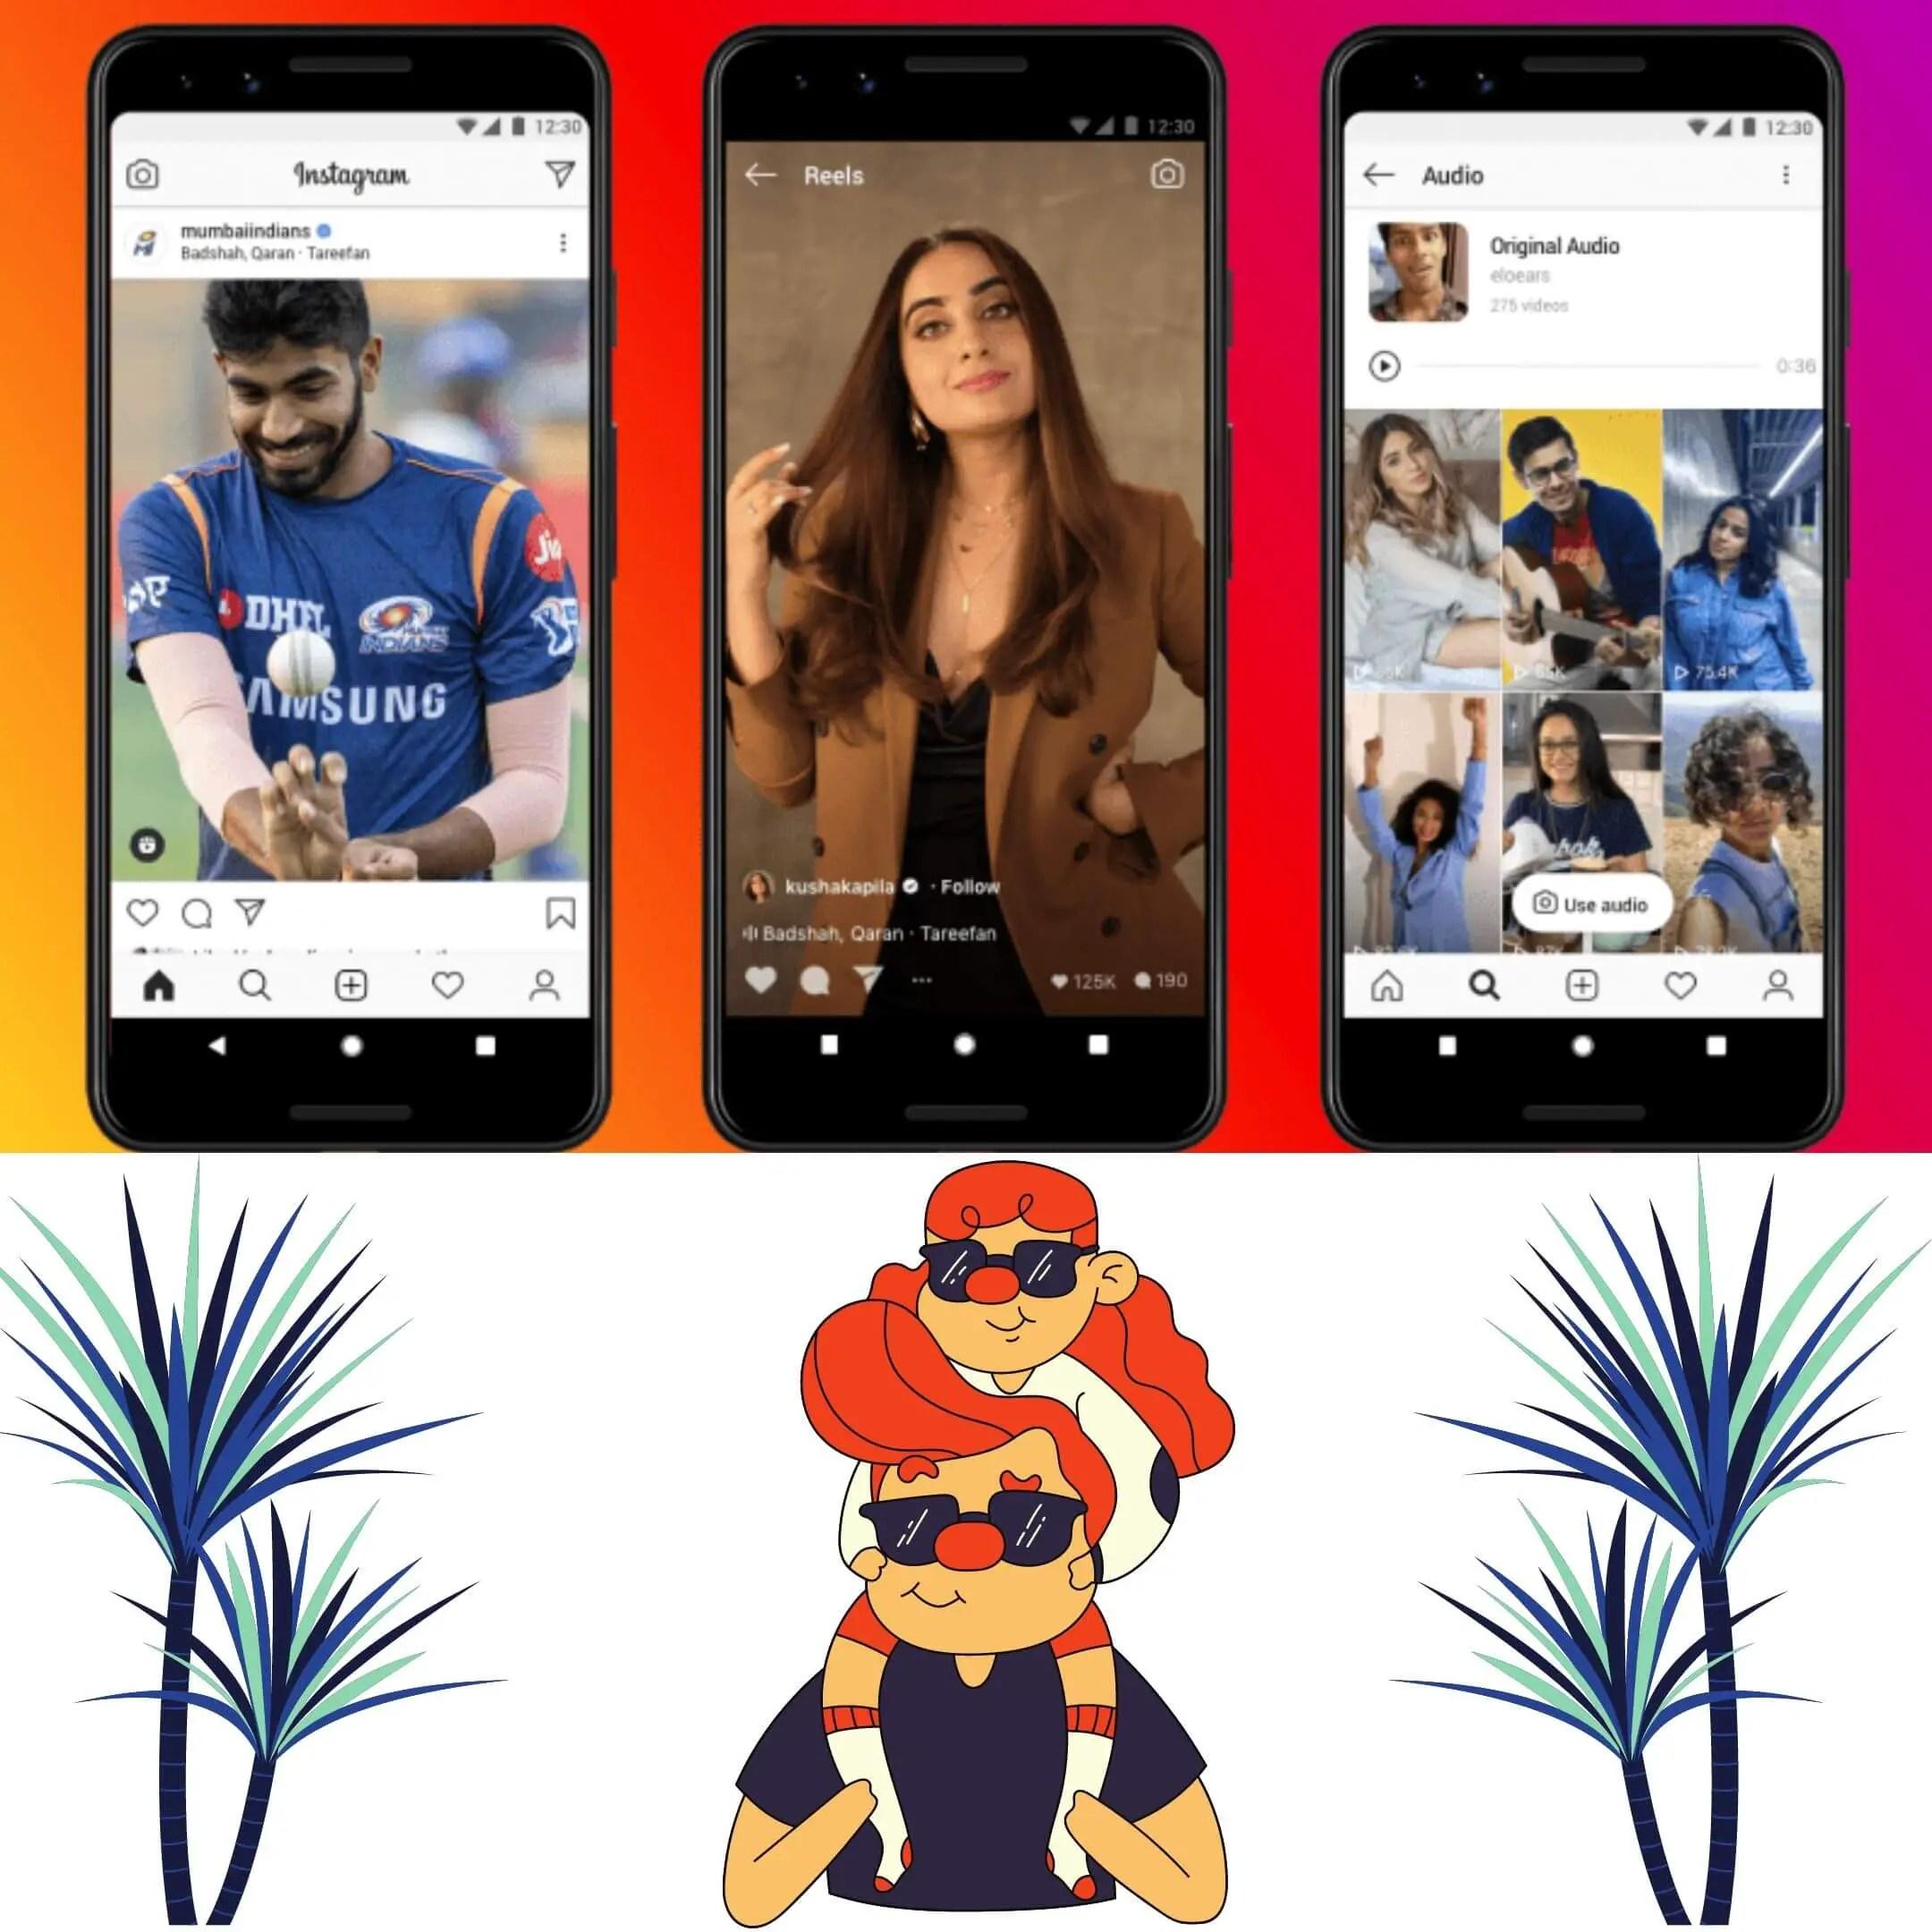 Instagram will launch Reels to the U.S in August. Reels vs Tiktok